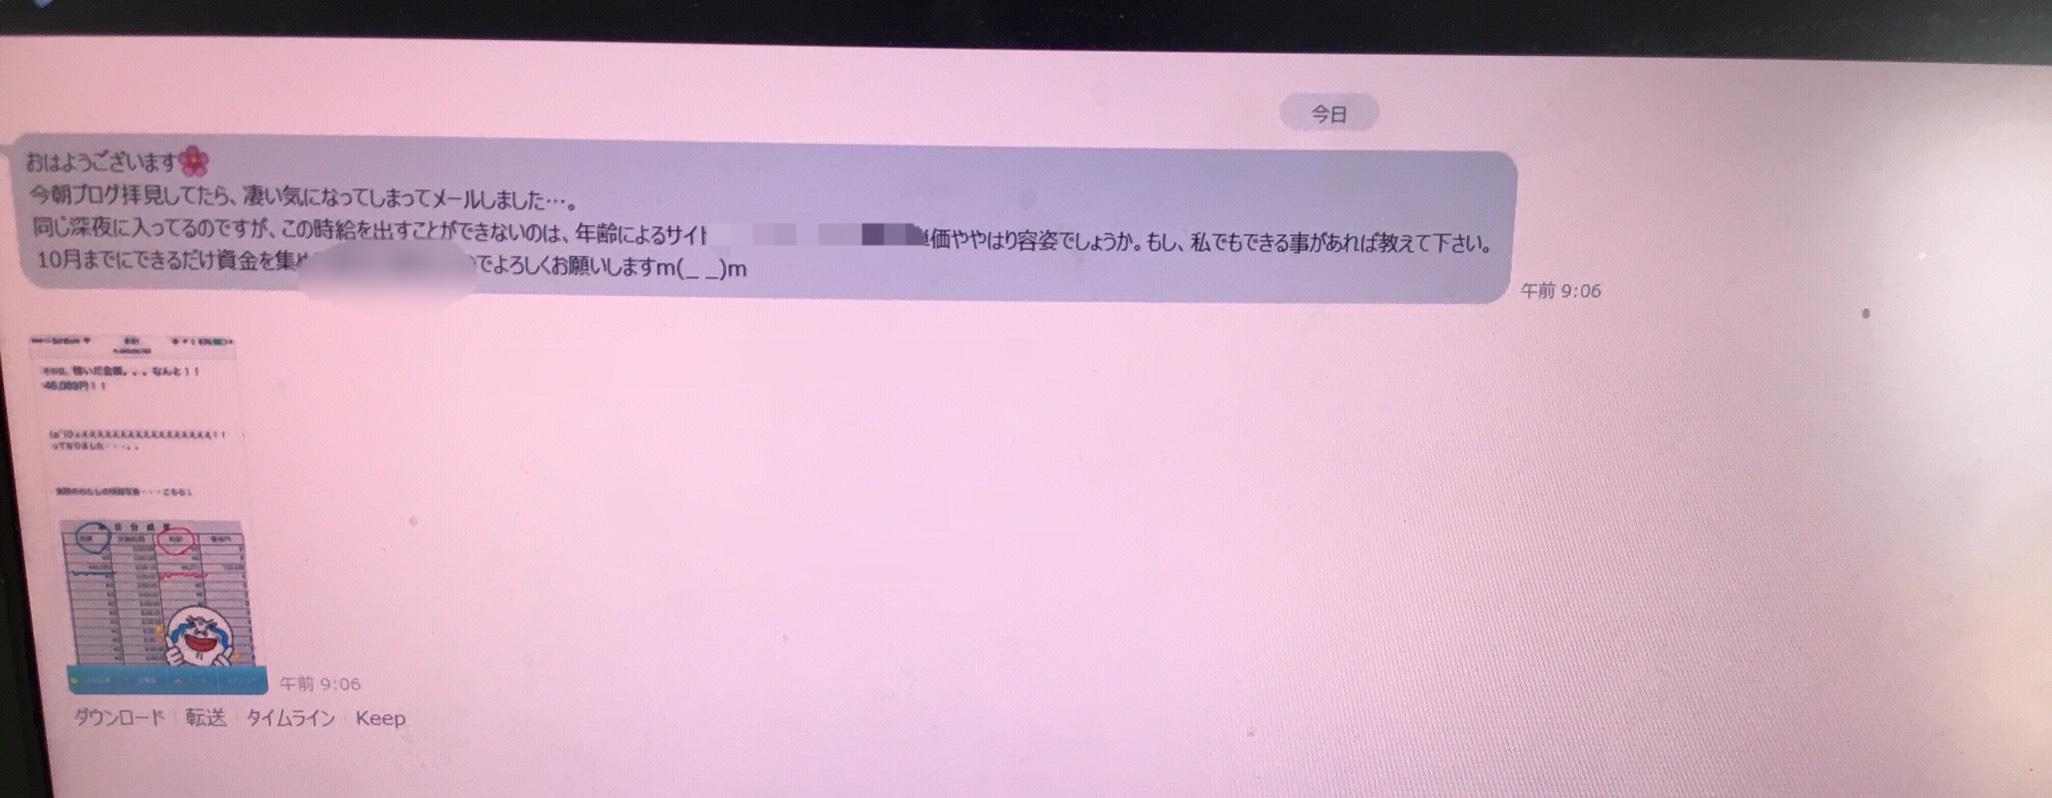 S__8380420.jpg